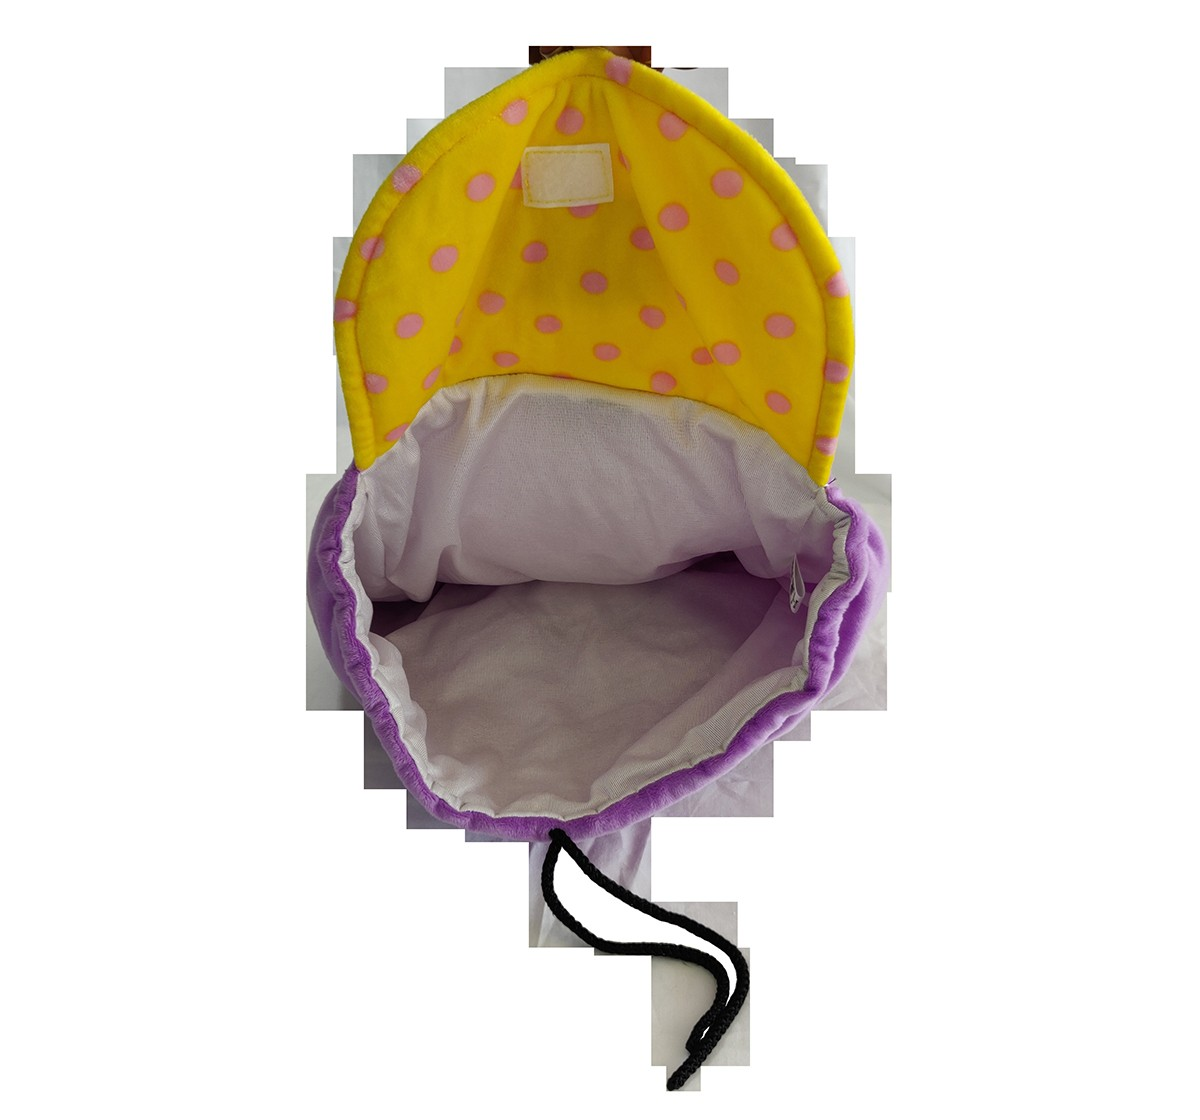 "Chhota Bheem Kfd Kia 3D Face Plush Bag - 12"" Plush Accessories for Kids age 3Y+ - 30.5 Cm (Purple)"